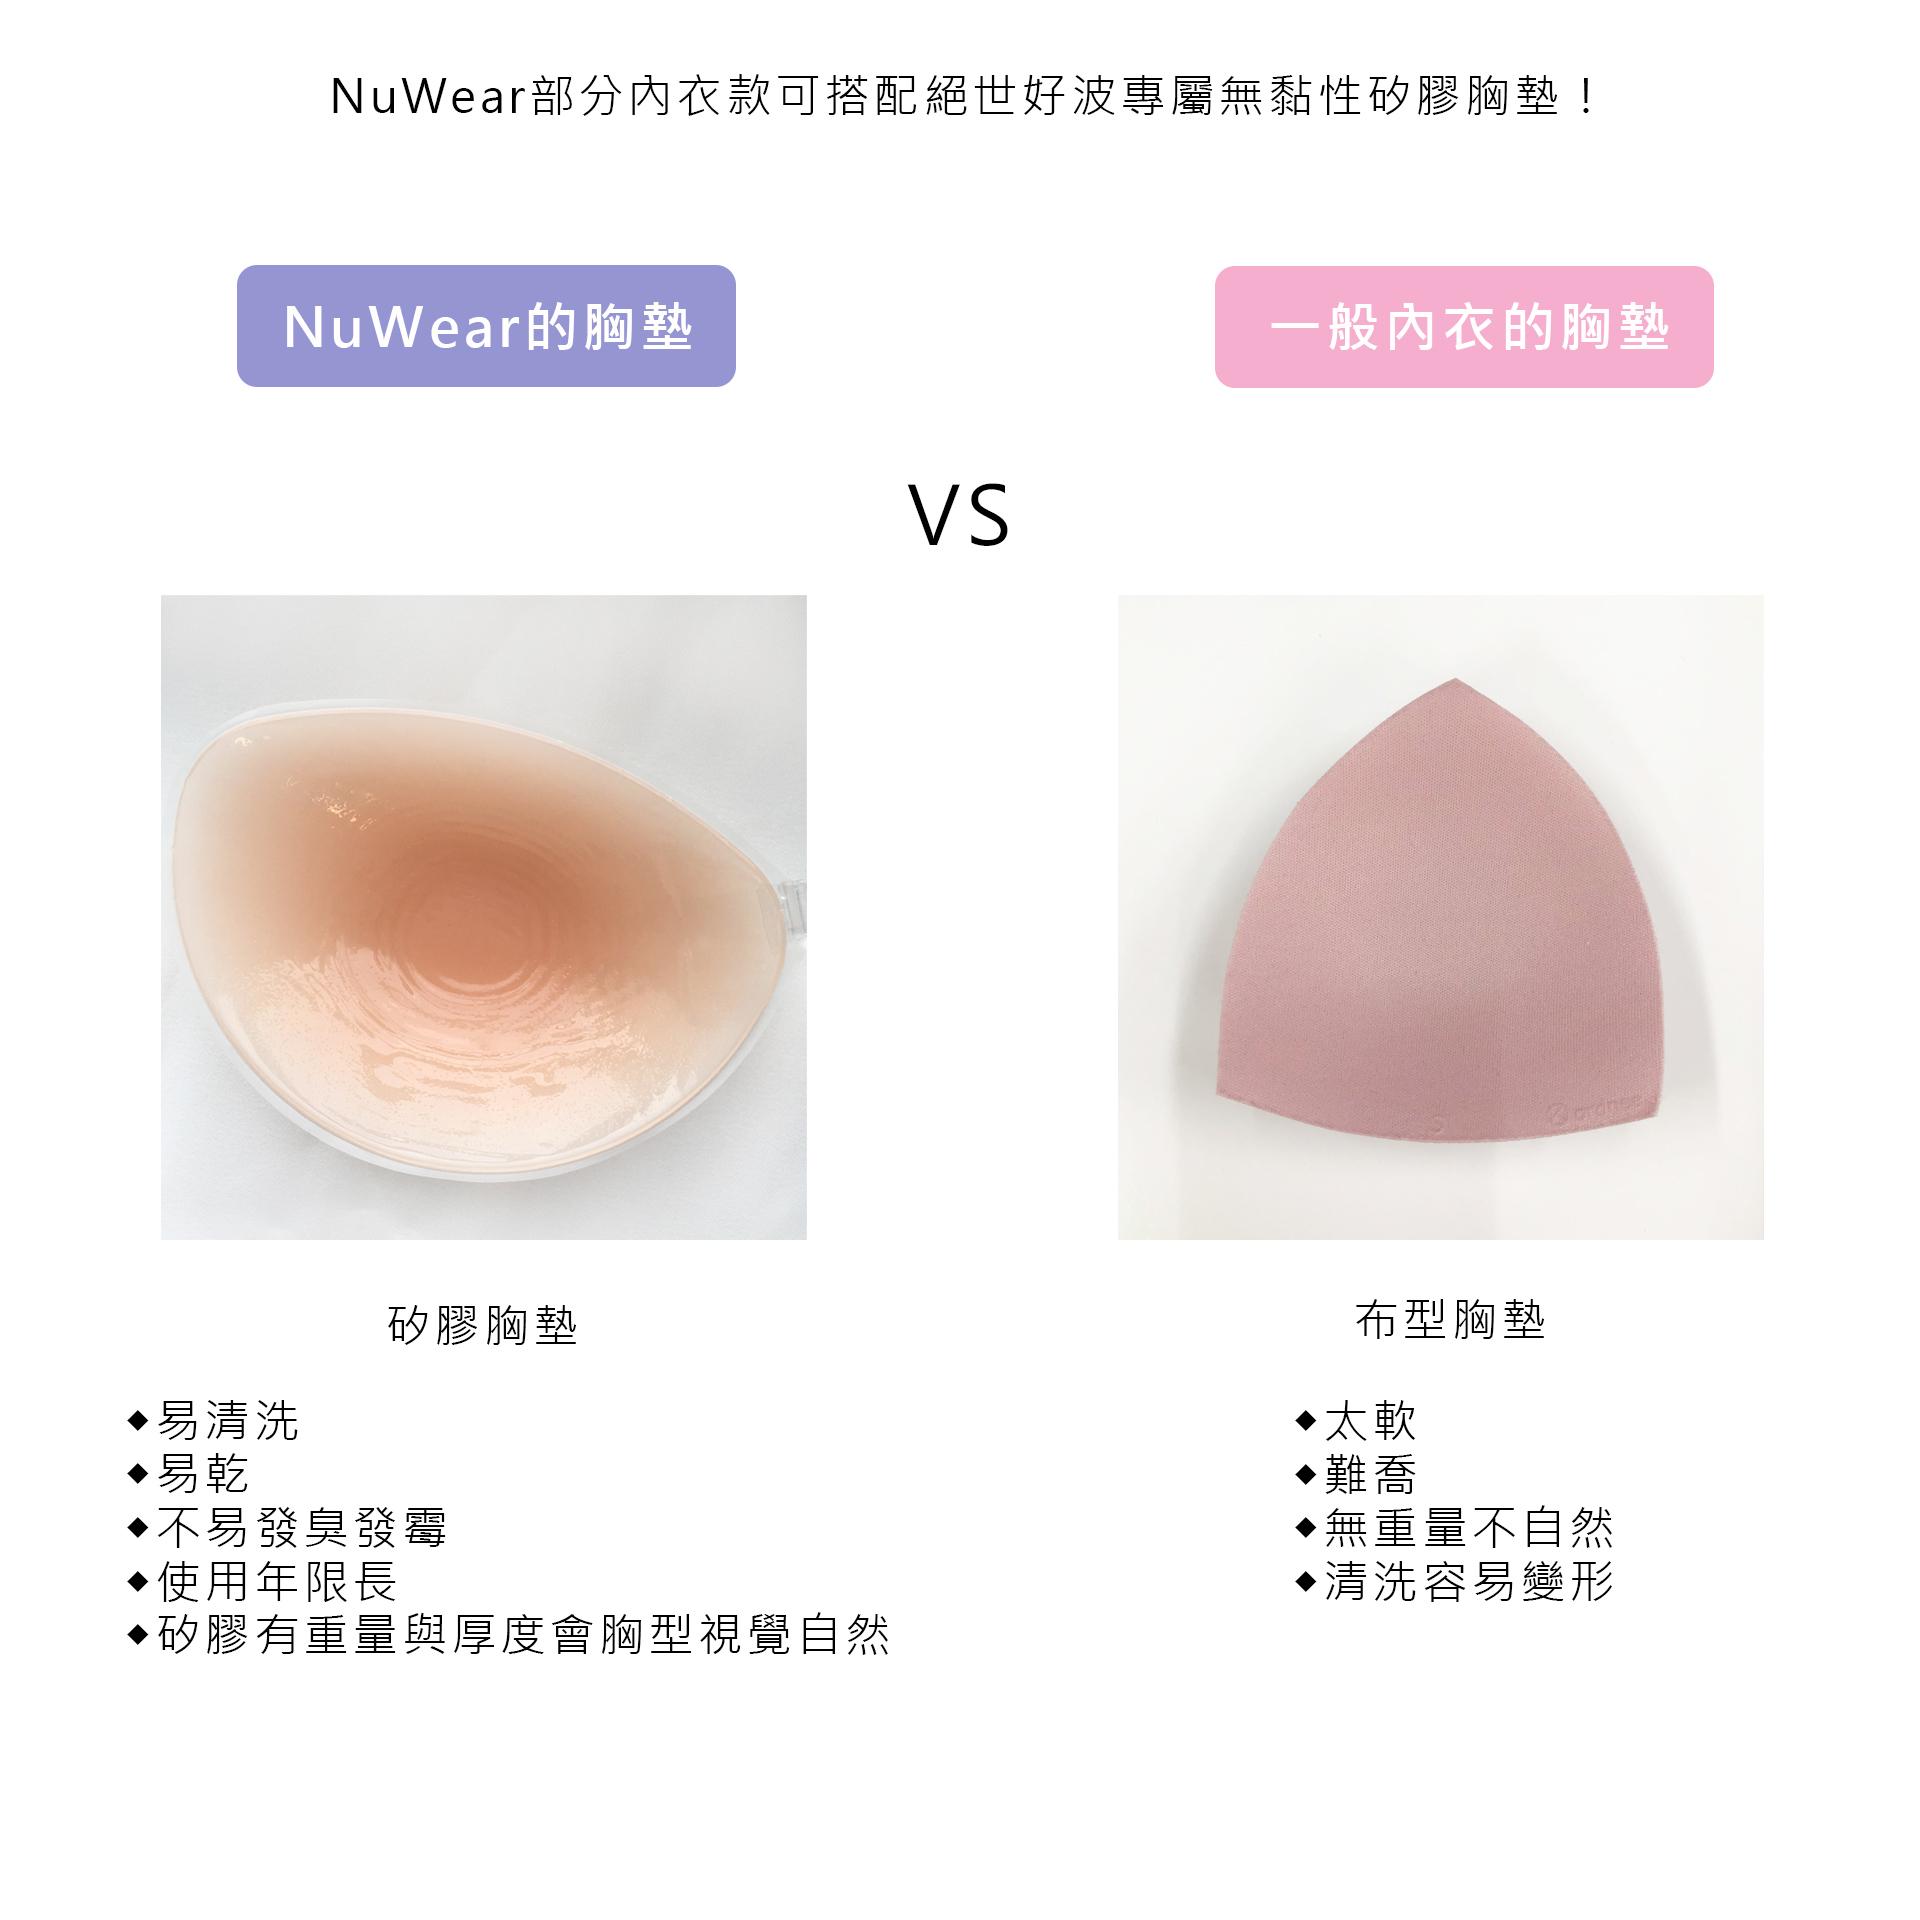 NuBra,NuWear,絕世好波,內衣,內睡衣,新品,好穿,比較,矽膠胸墊,傳統襯墊,布面胸墊,胸墊比較,NuBra好處,NuWear優點,NuWear好處